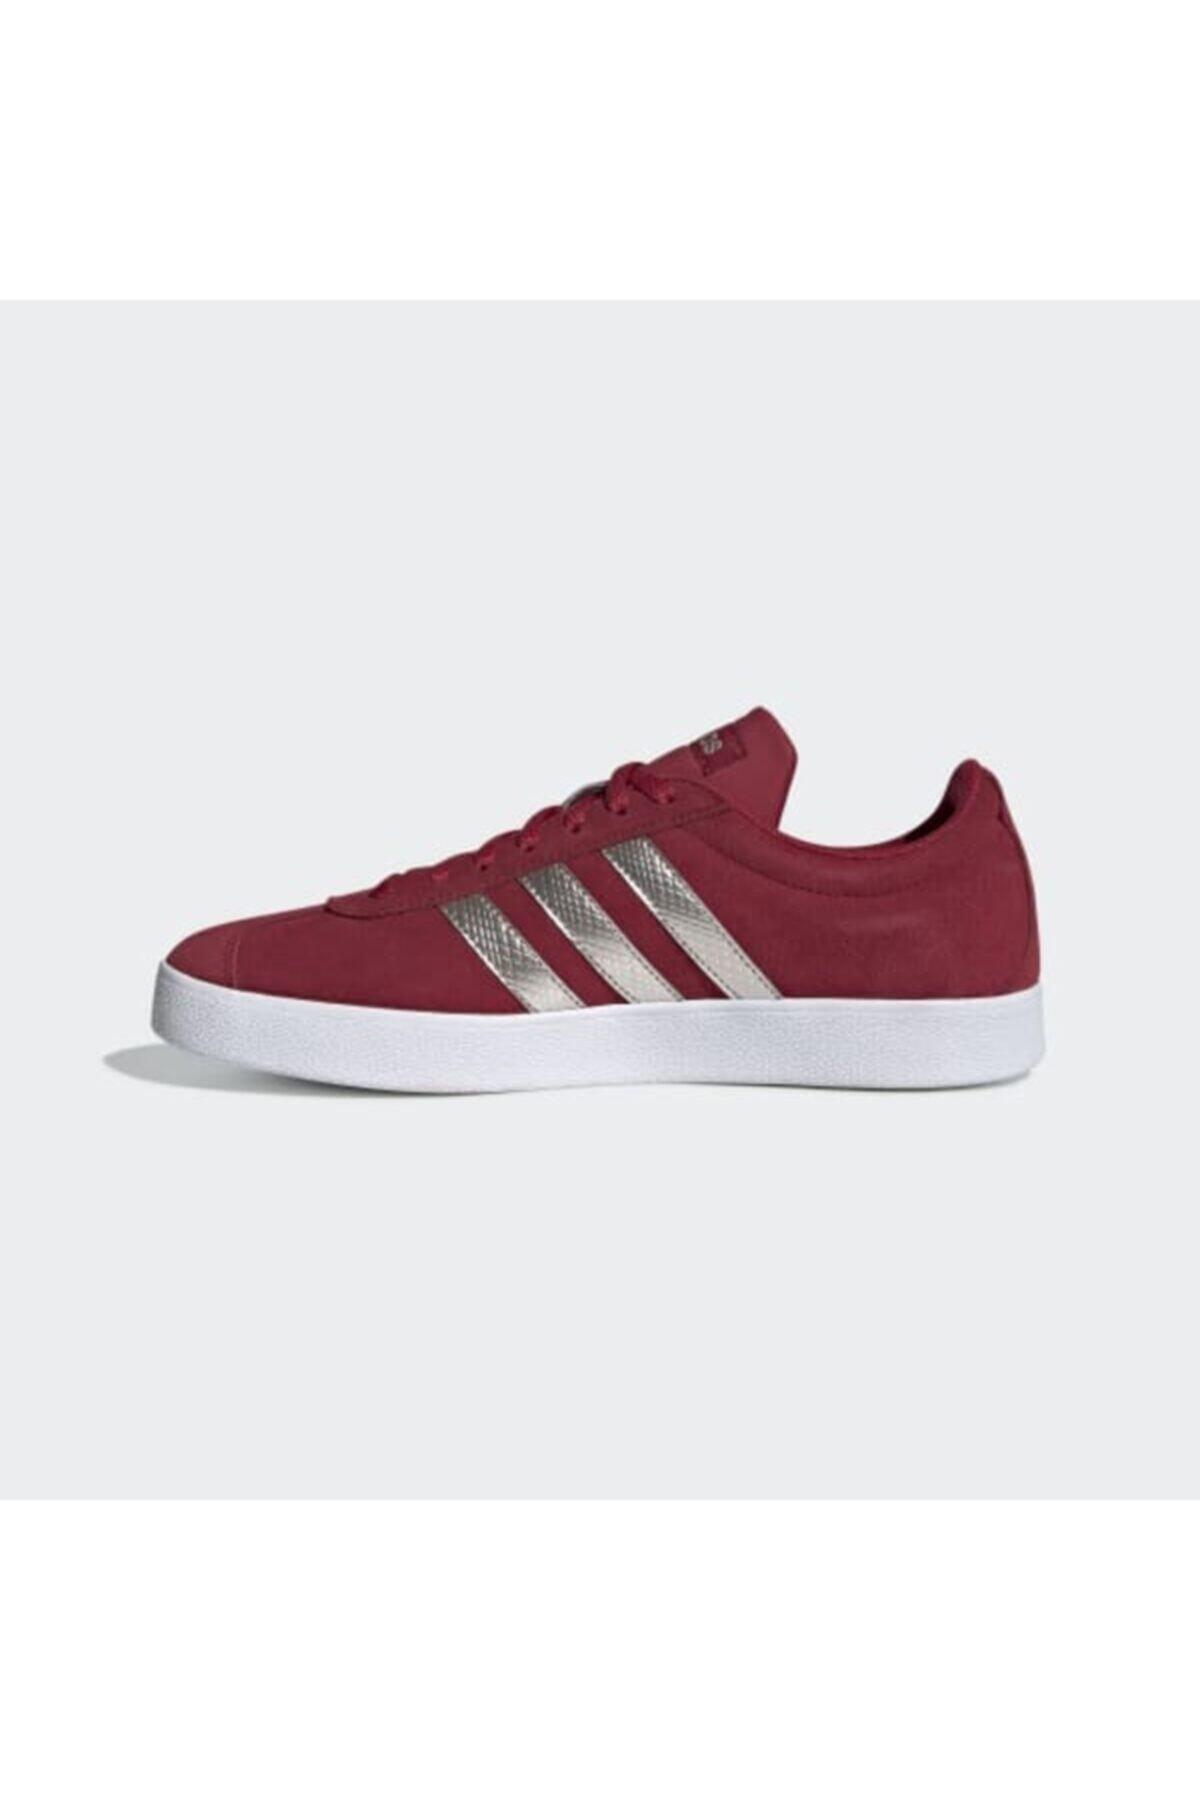 adidas Vl Court 2.0 Ee6785 2